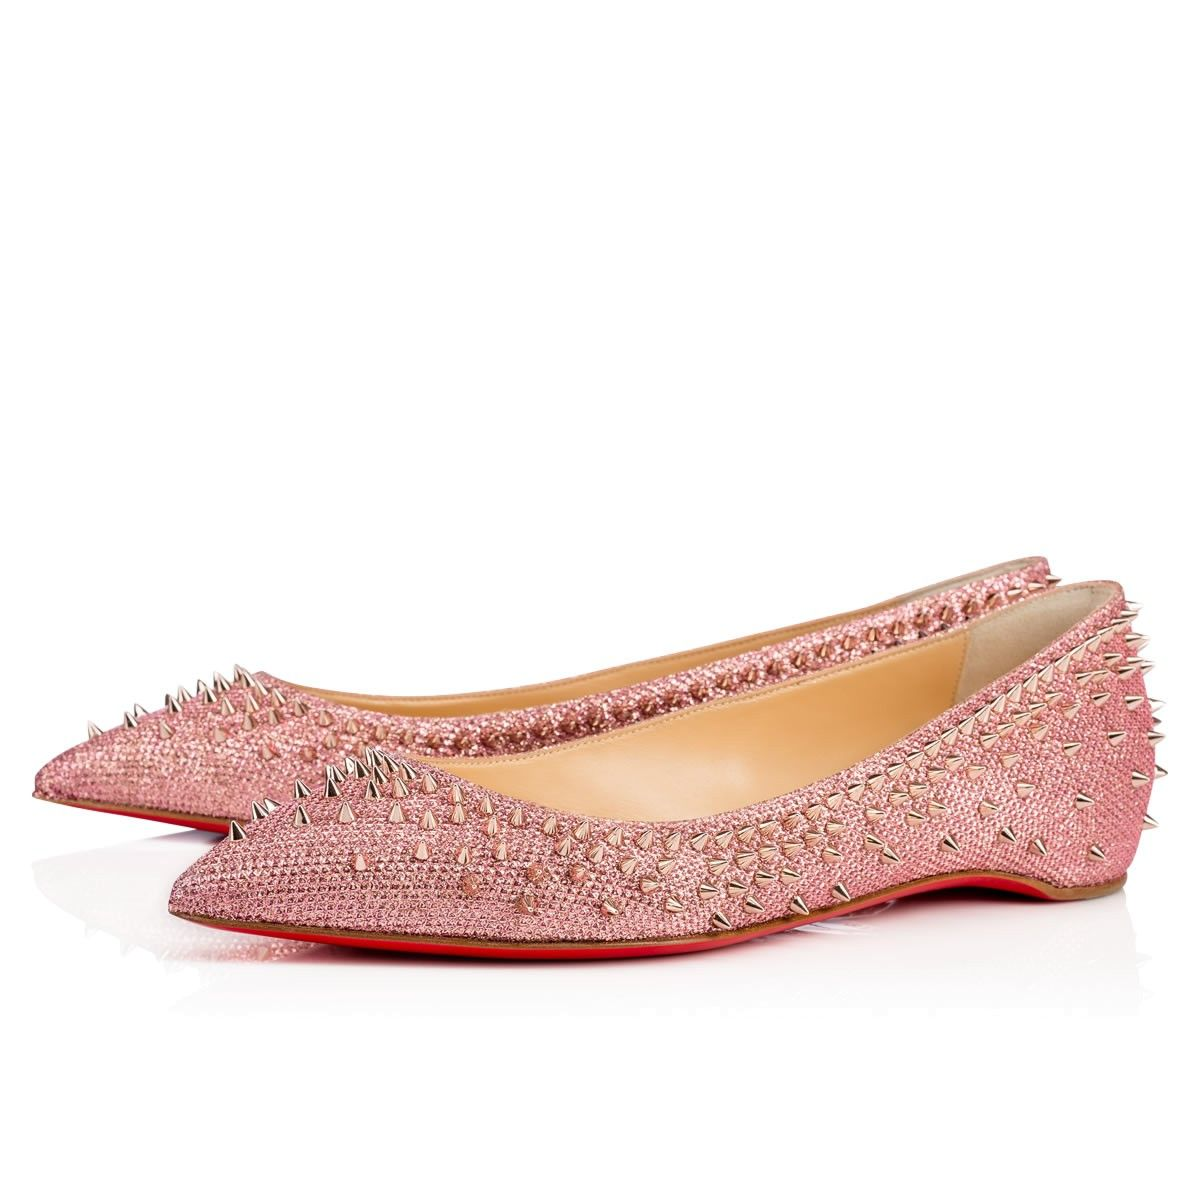 7c9715c9894 CHRISTIAN LOUBOUTIN Escarpic Flat Poudre/Pink Bronze Glitter - Women ...